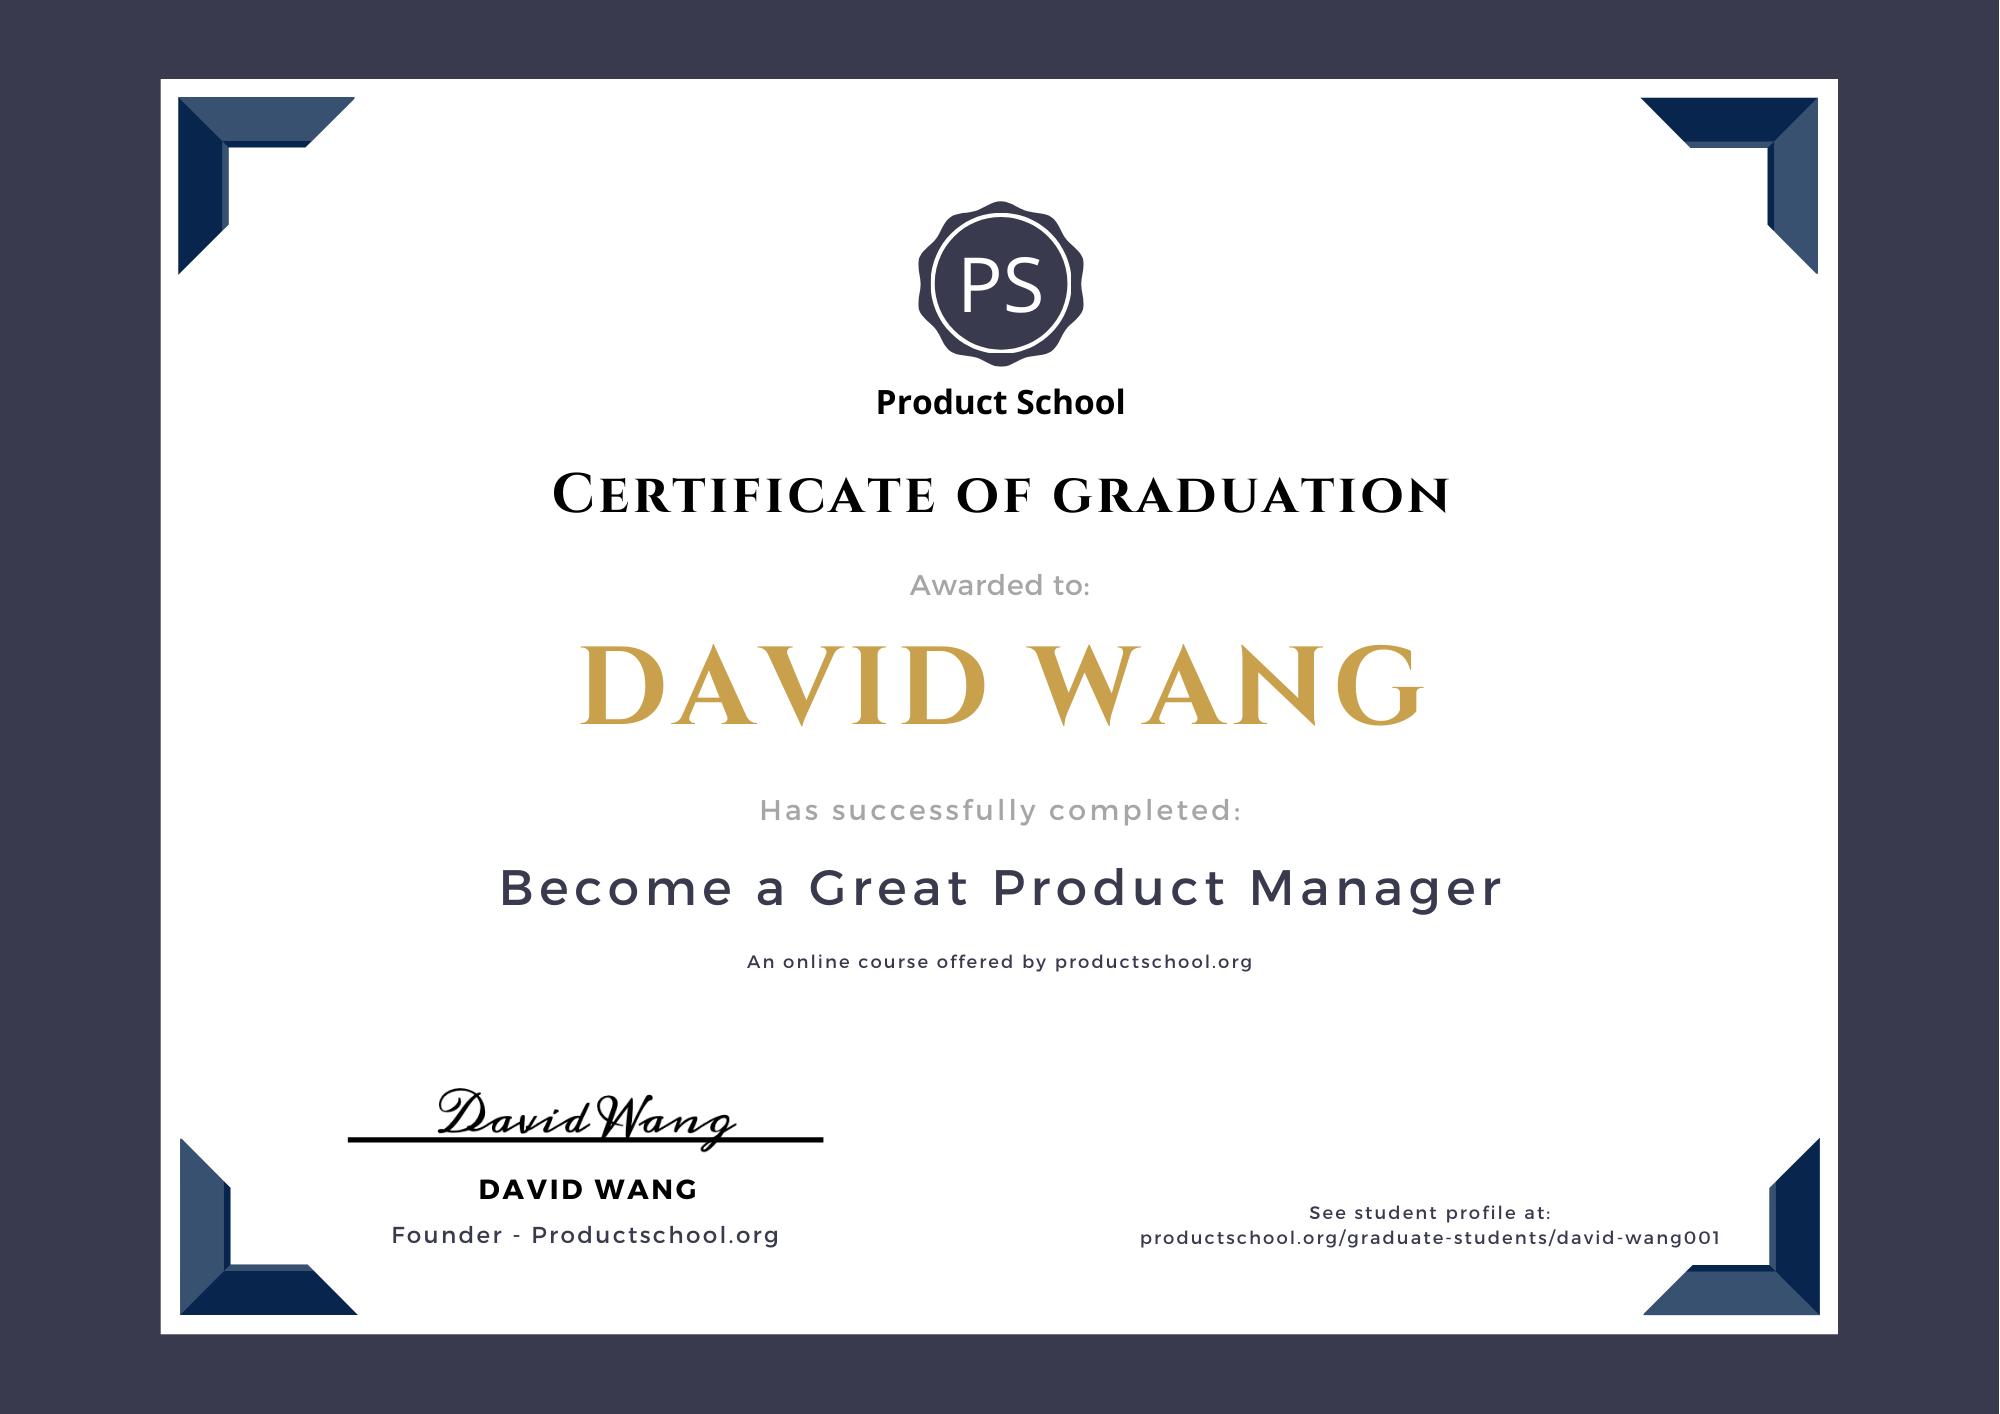 Product School Student Profile David Wang